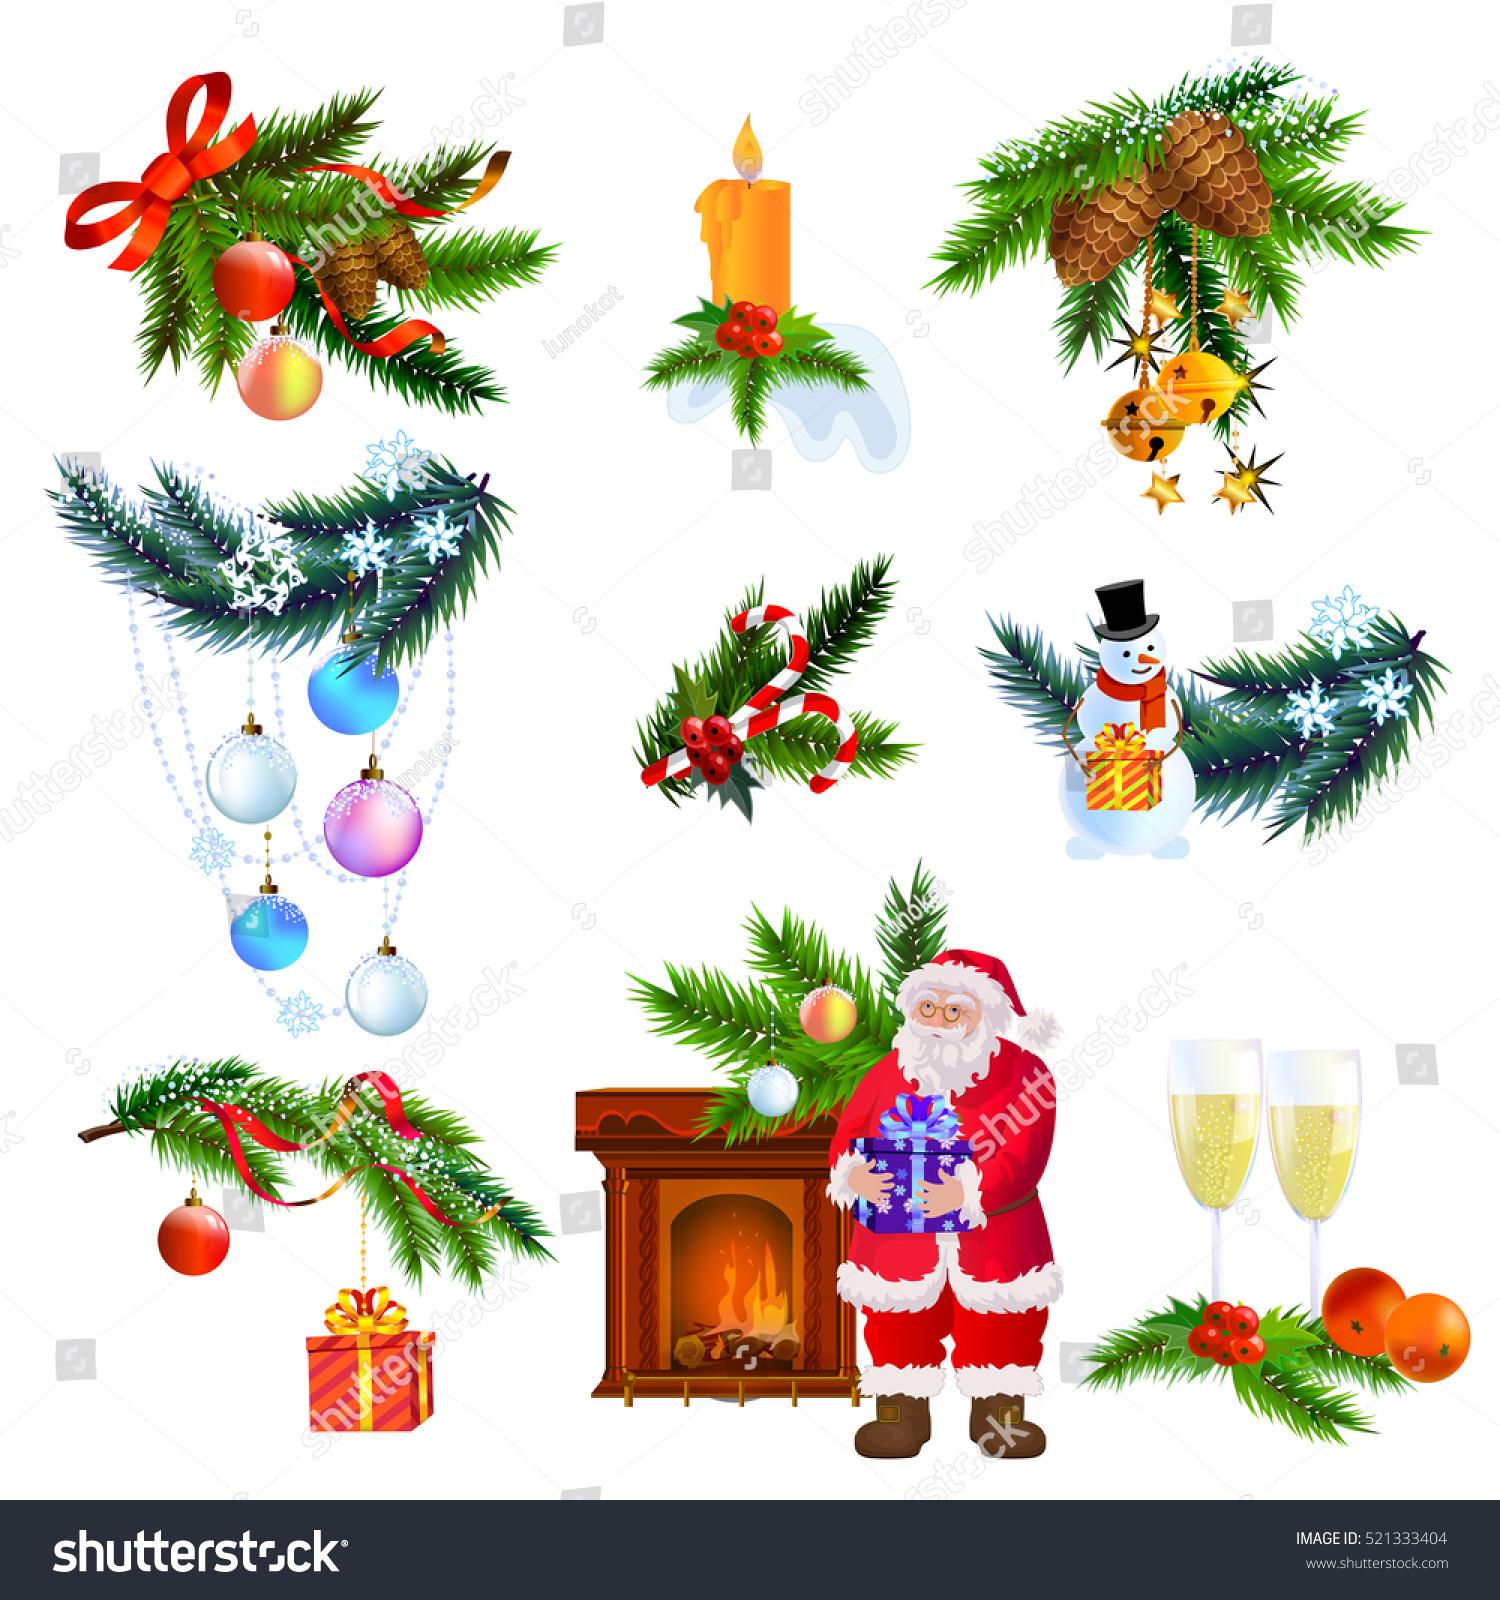 Christmas Tree Decoration Elements: Christmas New Year Decoration Elements Christmas Stock